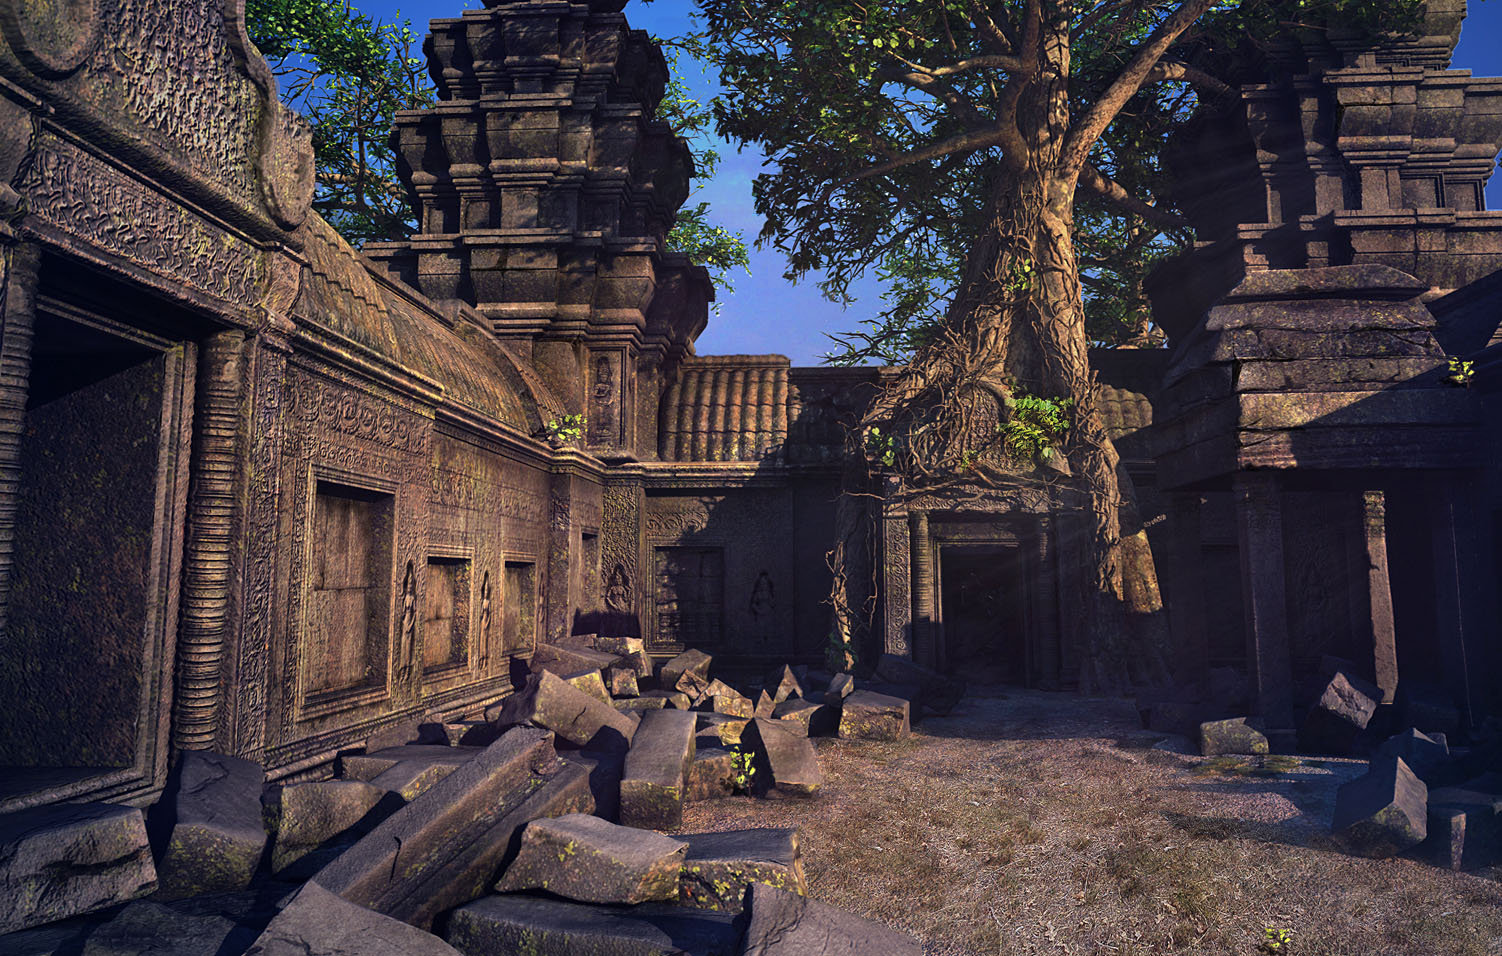 Virendra pratap singh mrcraft temple of angkor